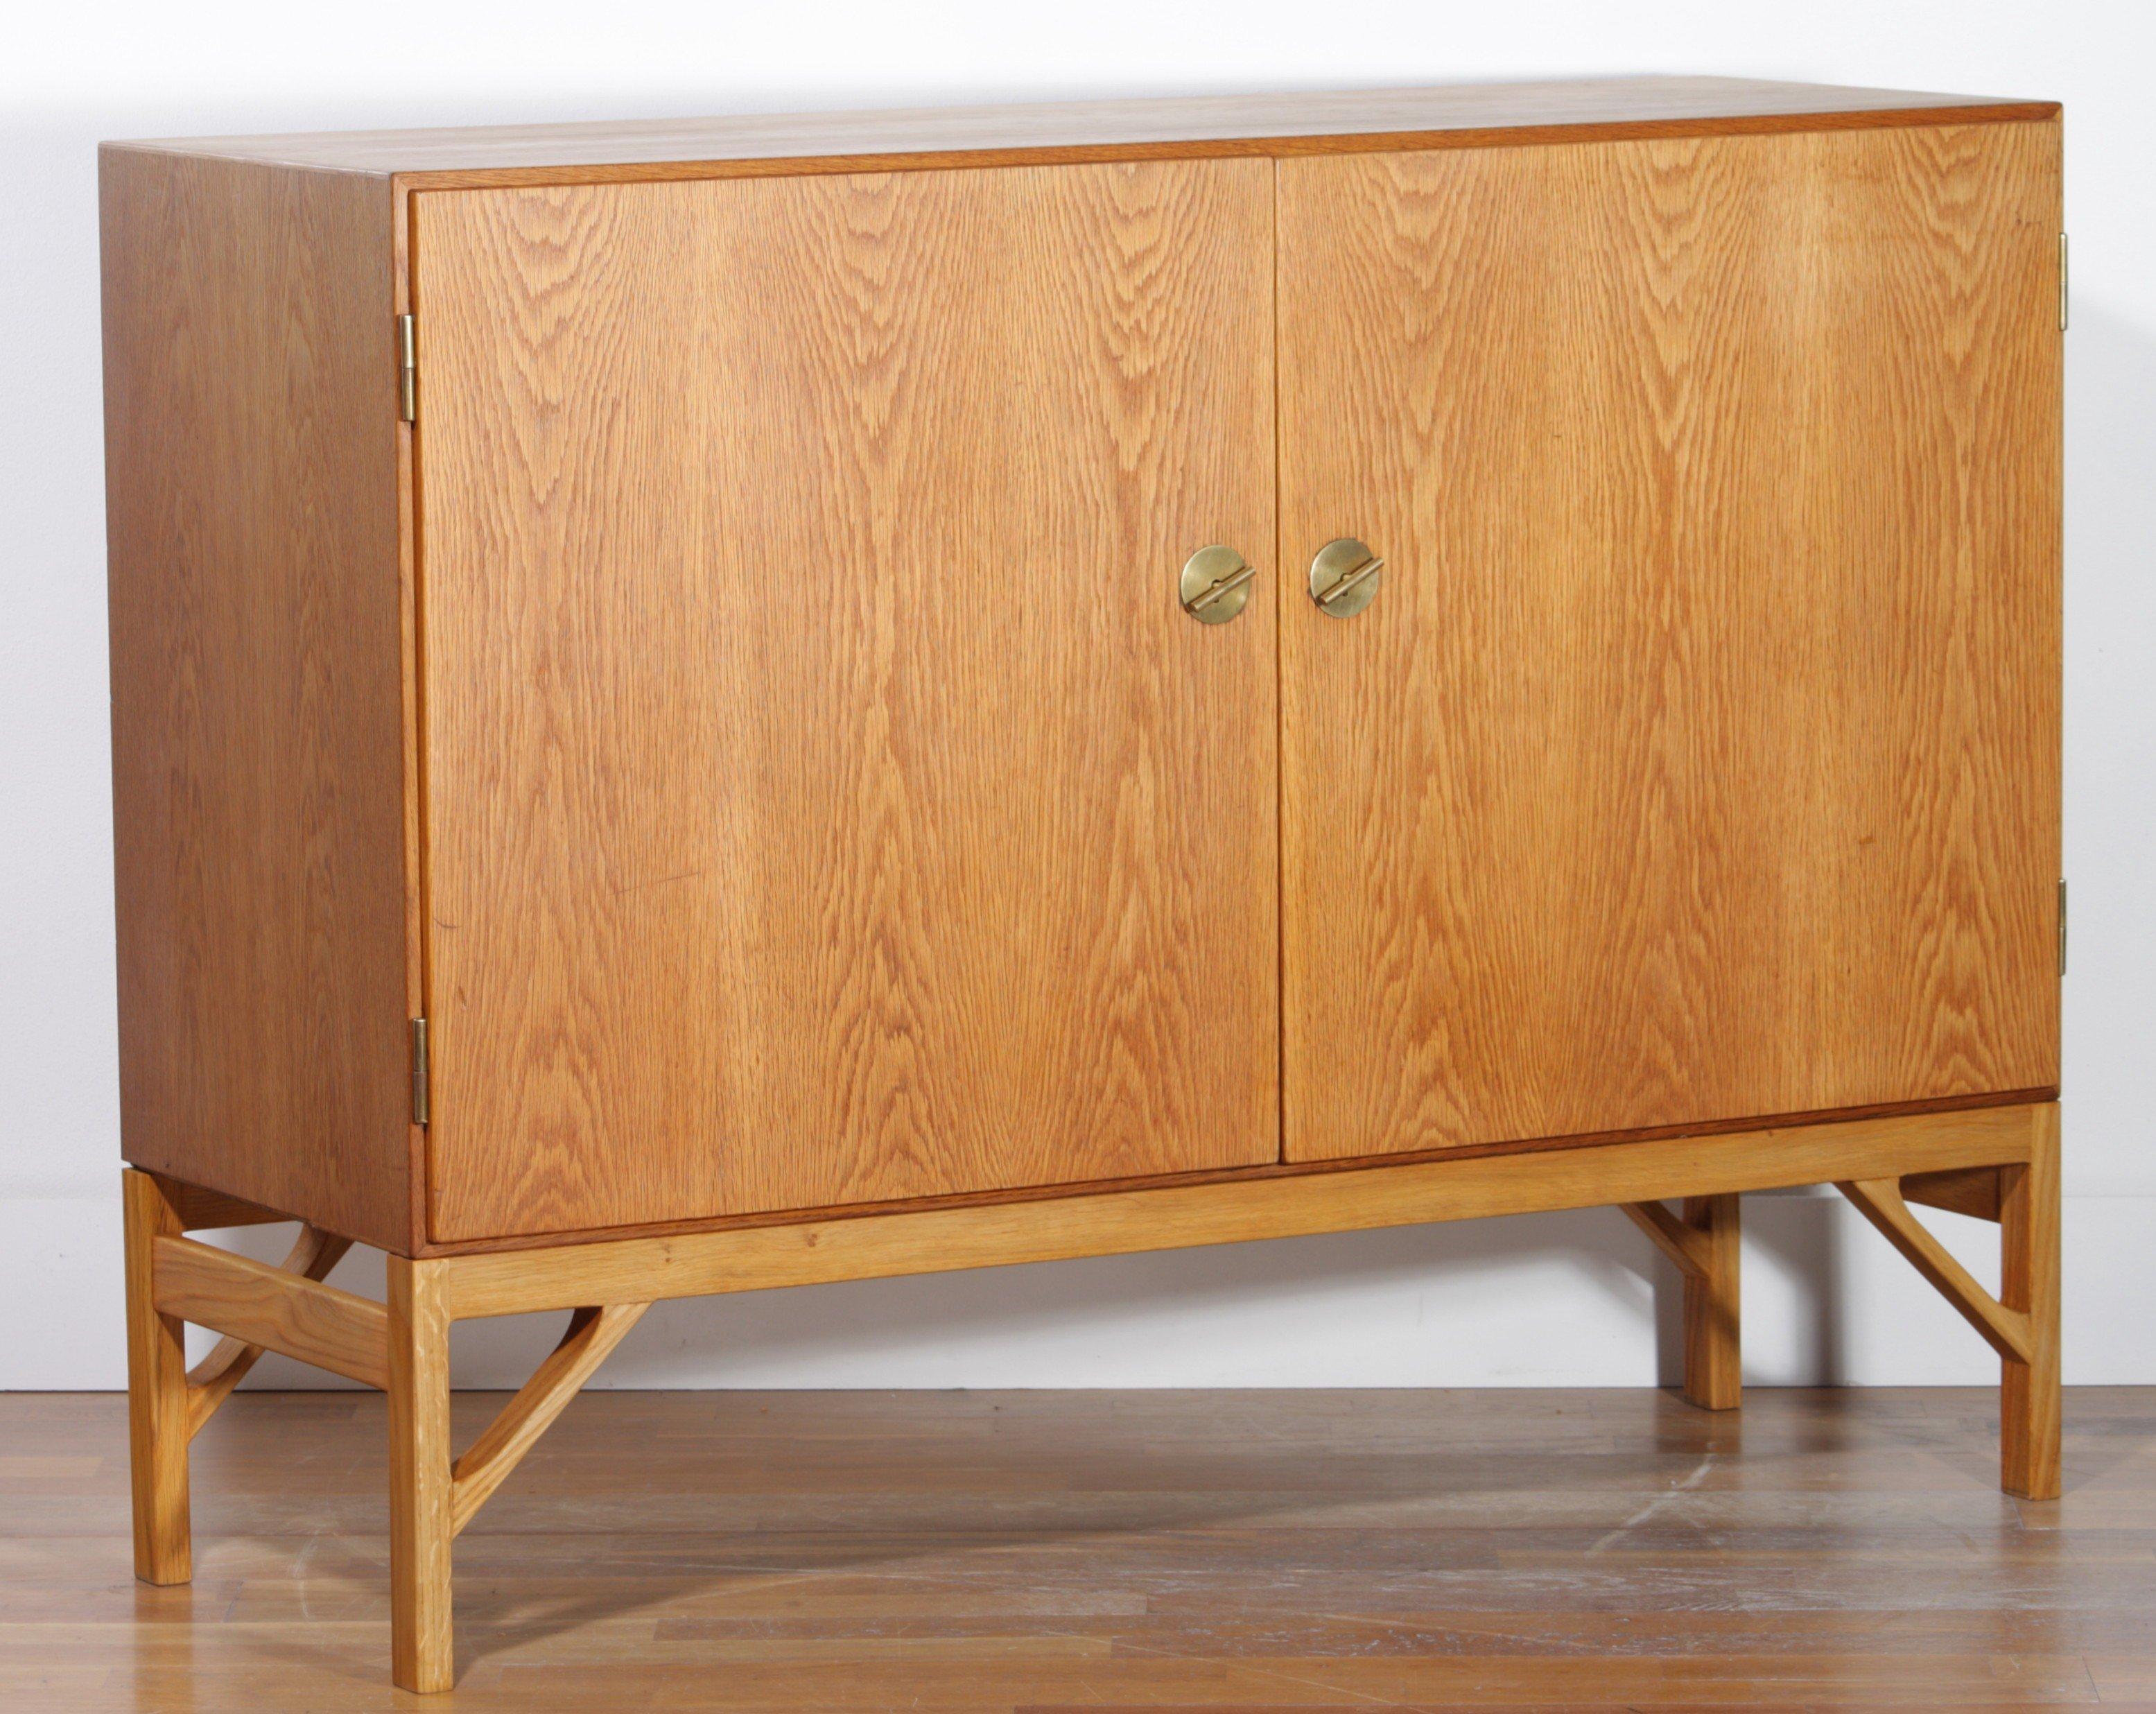 Small mid century sideboard in oak, Borge MOGENSEN - 1950s - Design on